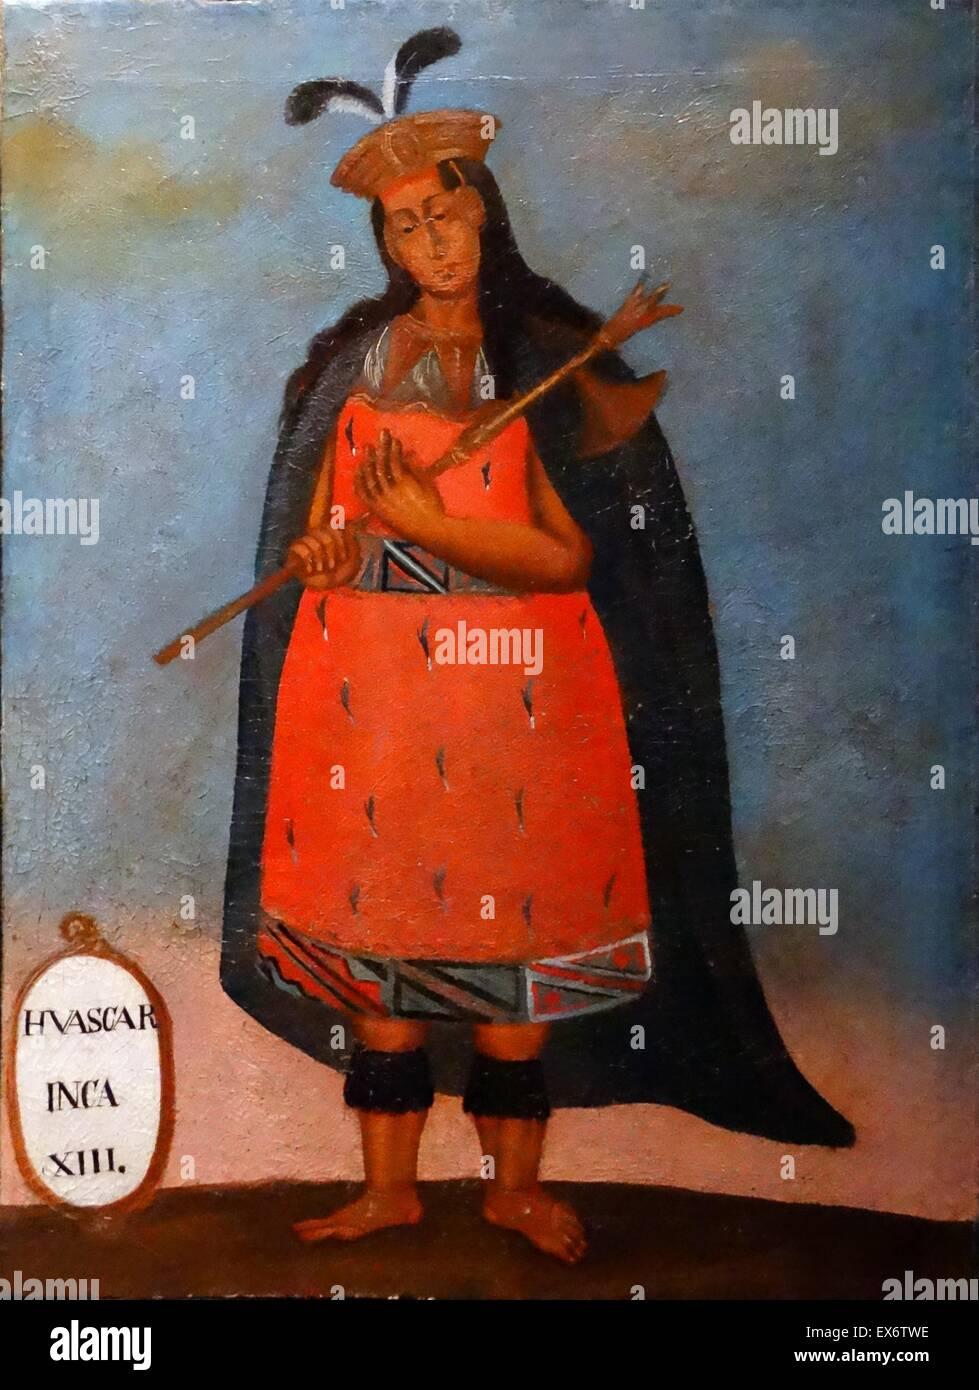 Spanish colonial portrait of the Inca King Huáscar Inca, 1503–1532. Sapa Inca of the Inca Empire from 1527 - Stock Image